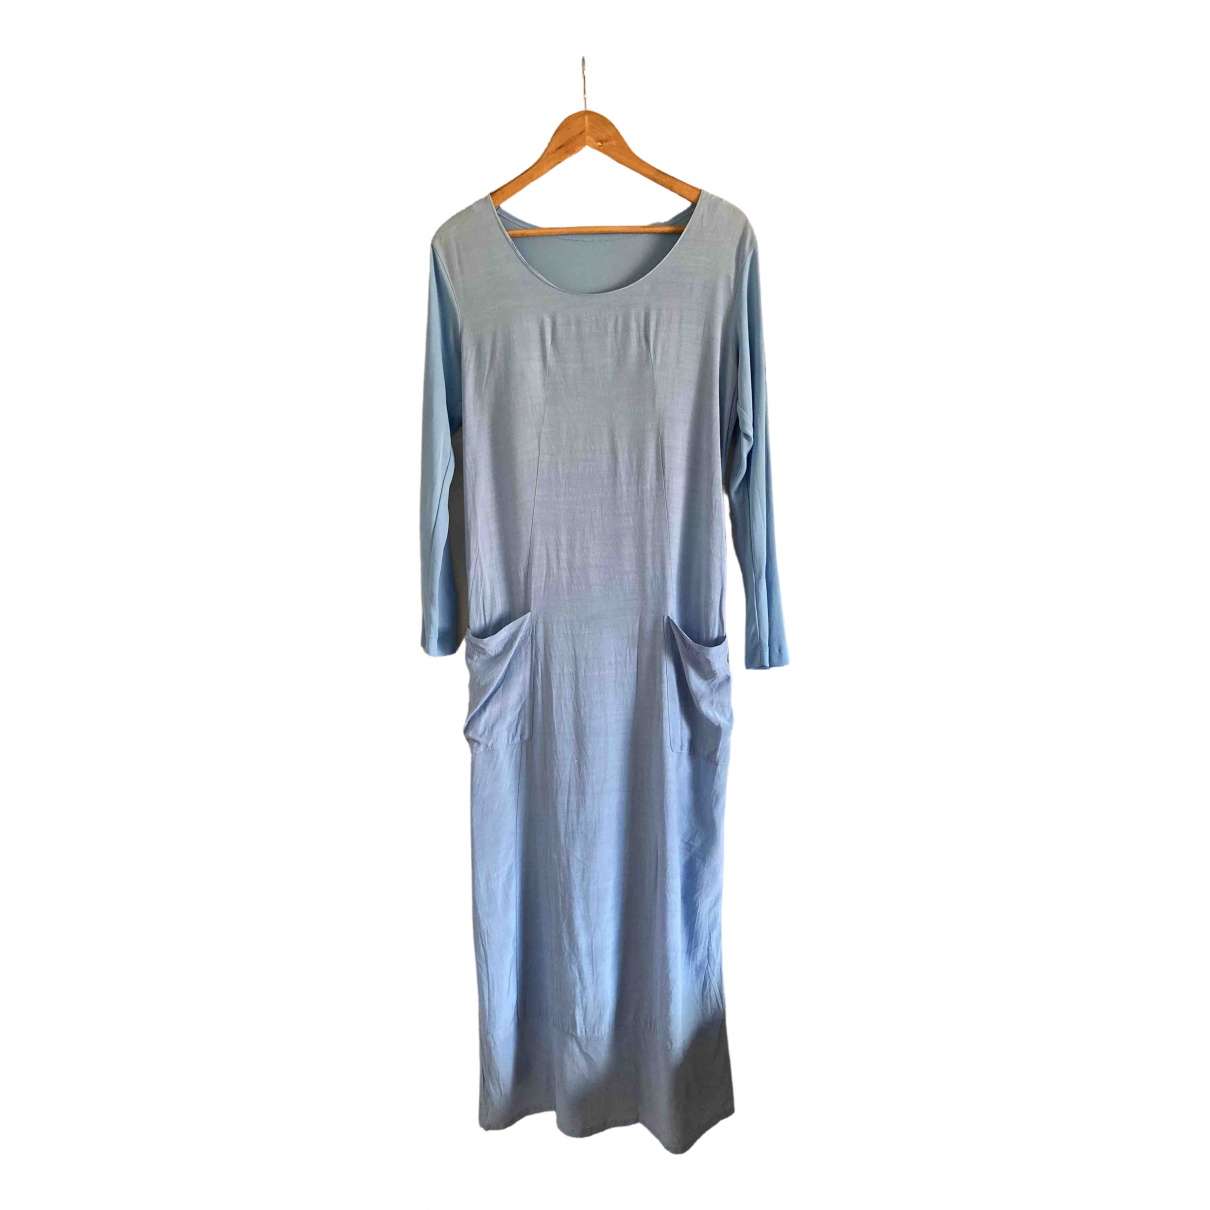 Comme Des Garcons \N Kleid in  Blau Polyester